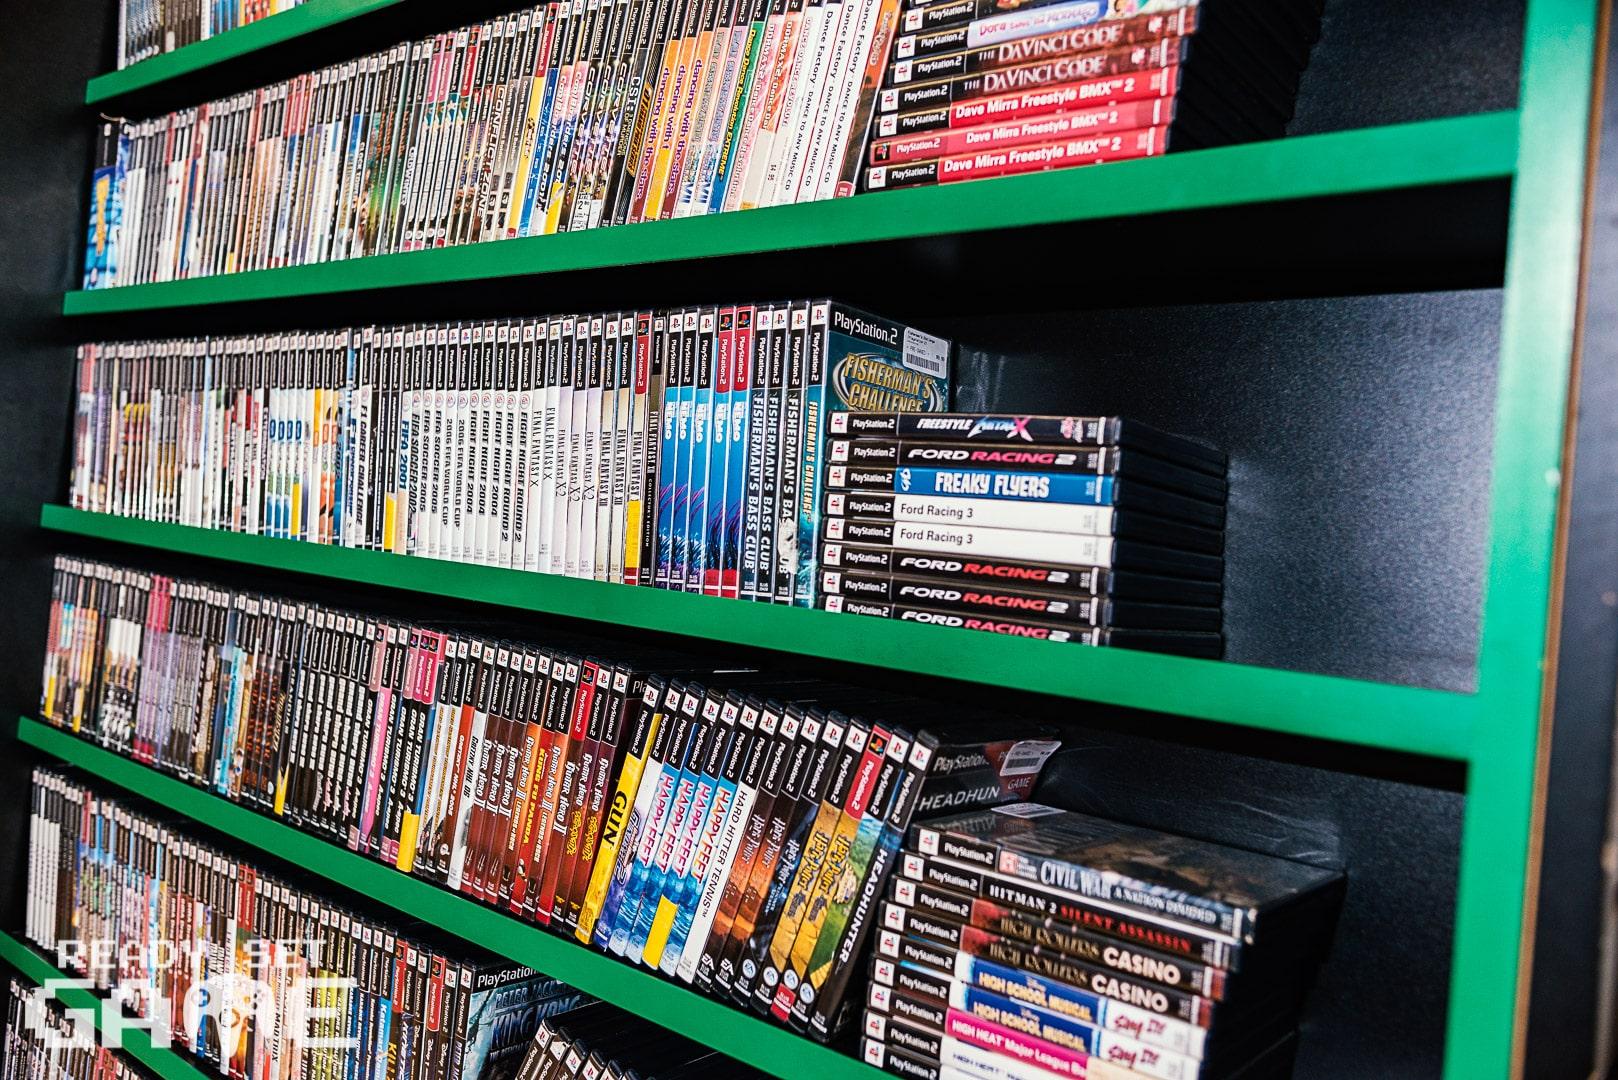 Ready set game videogame shelves.